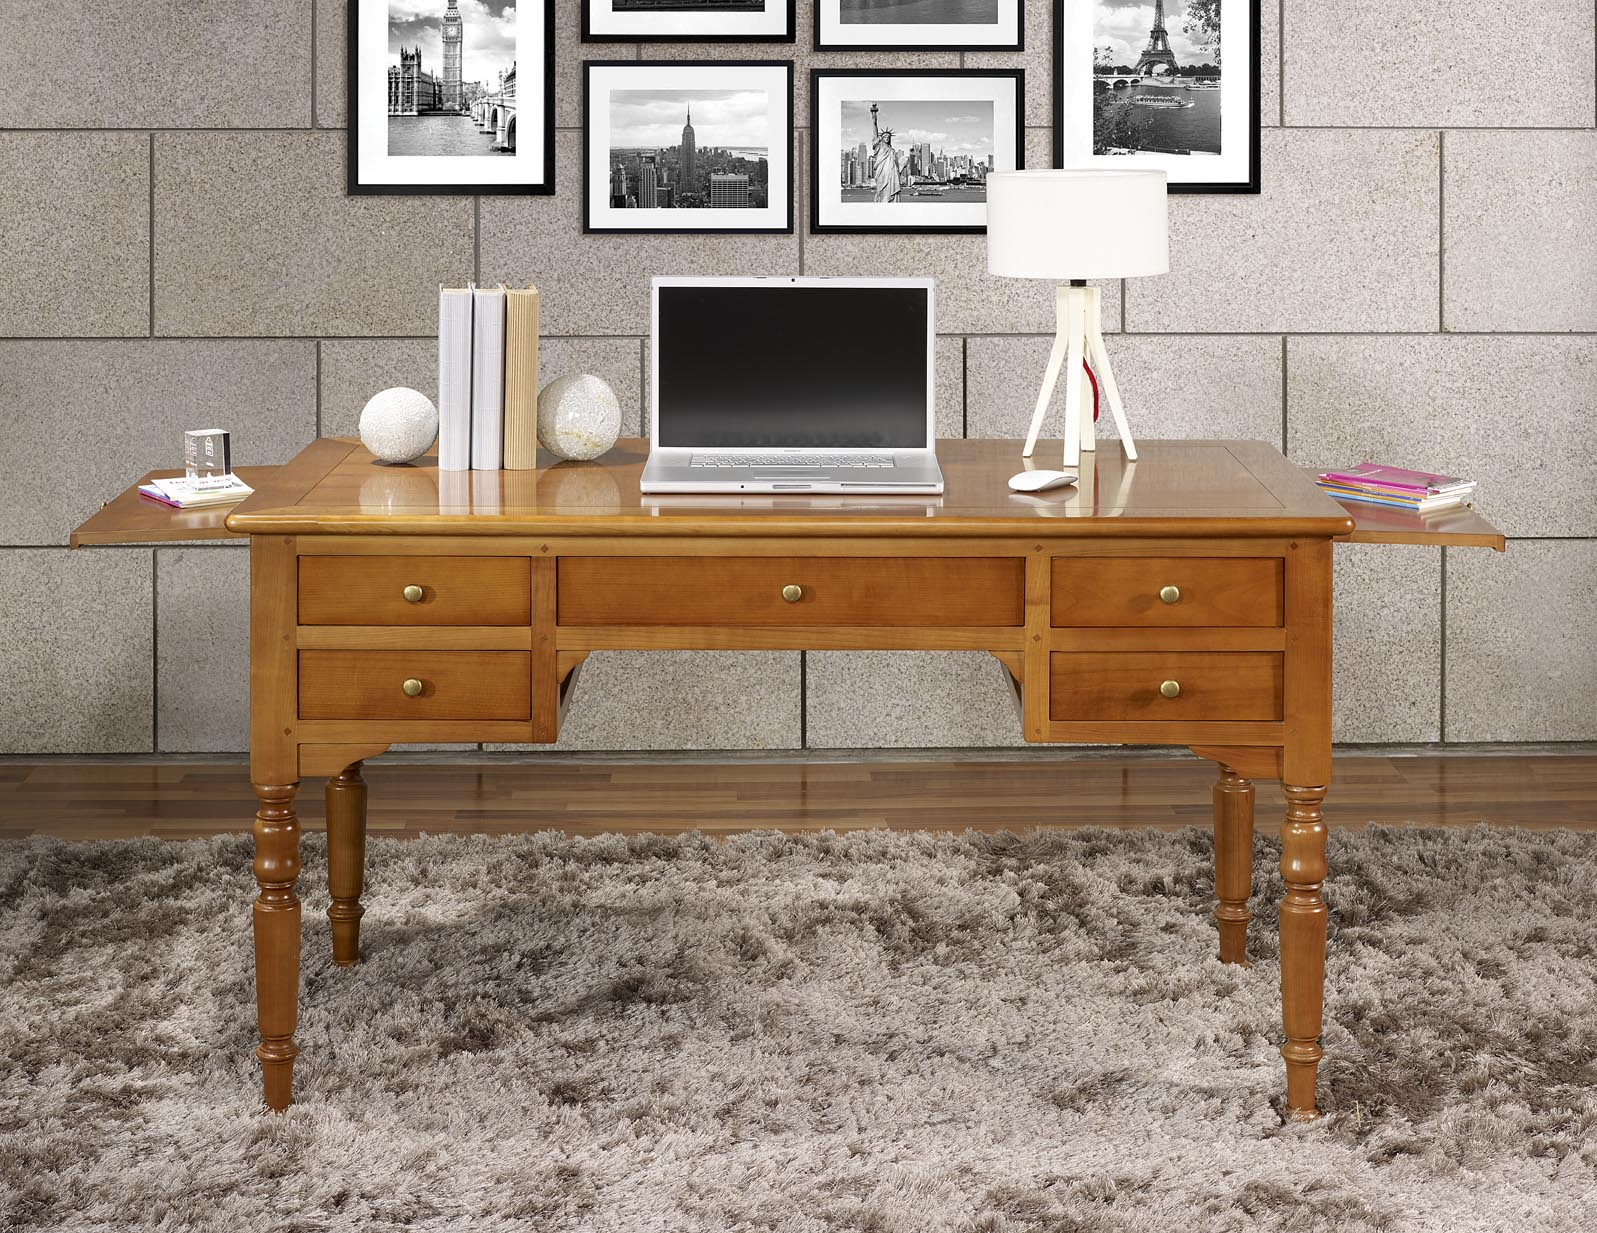 bureau ministre 5 tiroirs en merisier massif de style louis philippe meuble en merisier massif. Black Bedroom Furniture Sets. Home Design Ideas